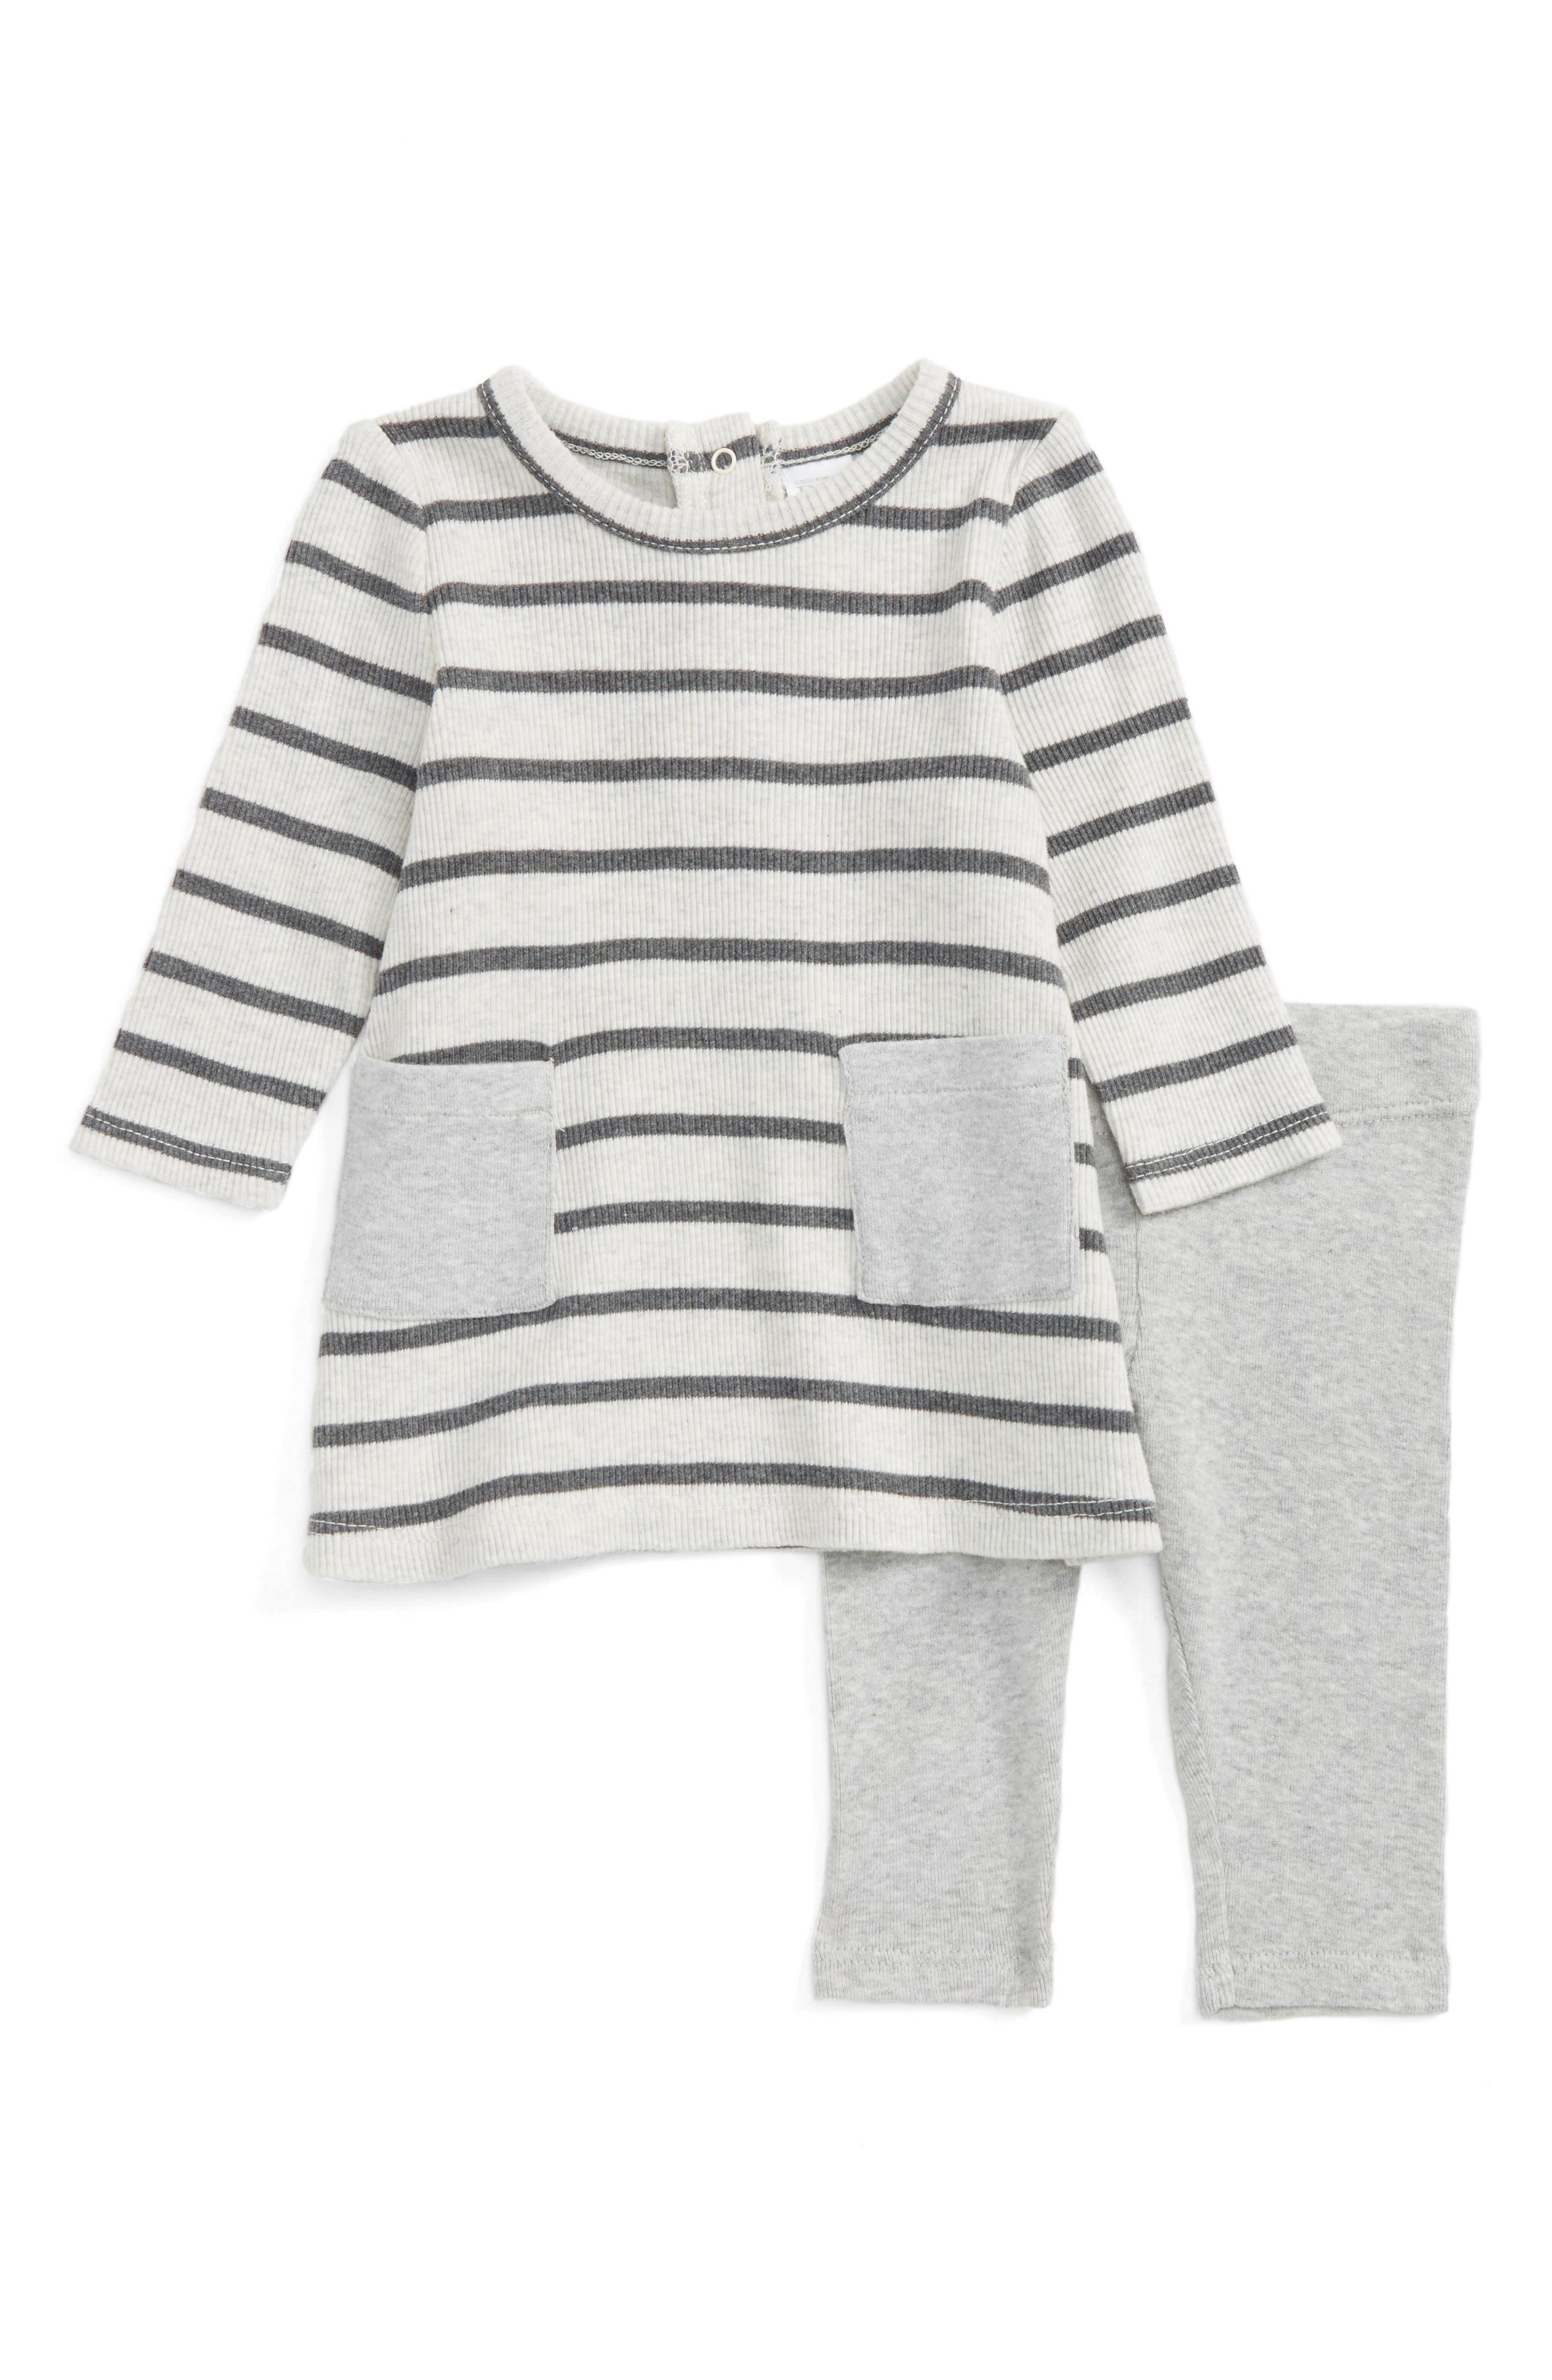 Stripe Dress & Leggings Set,                             Main thumbnail 1, color,                             Ivory Egret - Grey Stripe